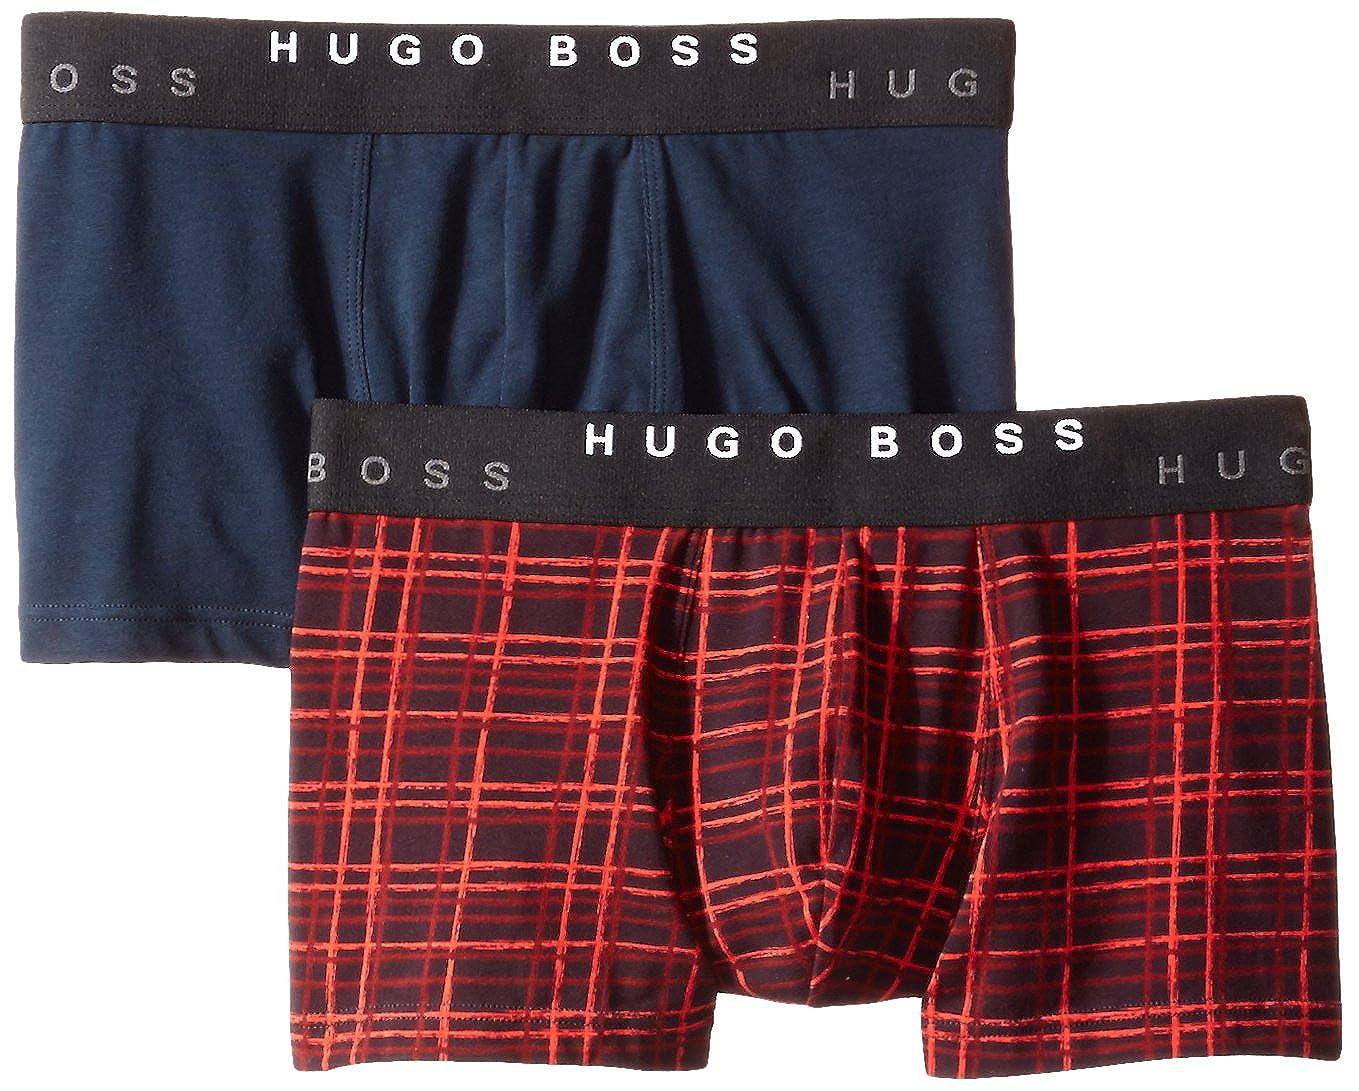 Hugo Boss BOSS Men's 2-Pack Cotton Stretch Boxer Brief HUGO BOSS Men' s Underwear 50271737